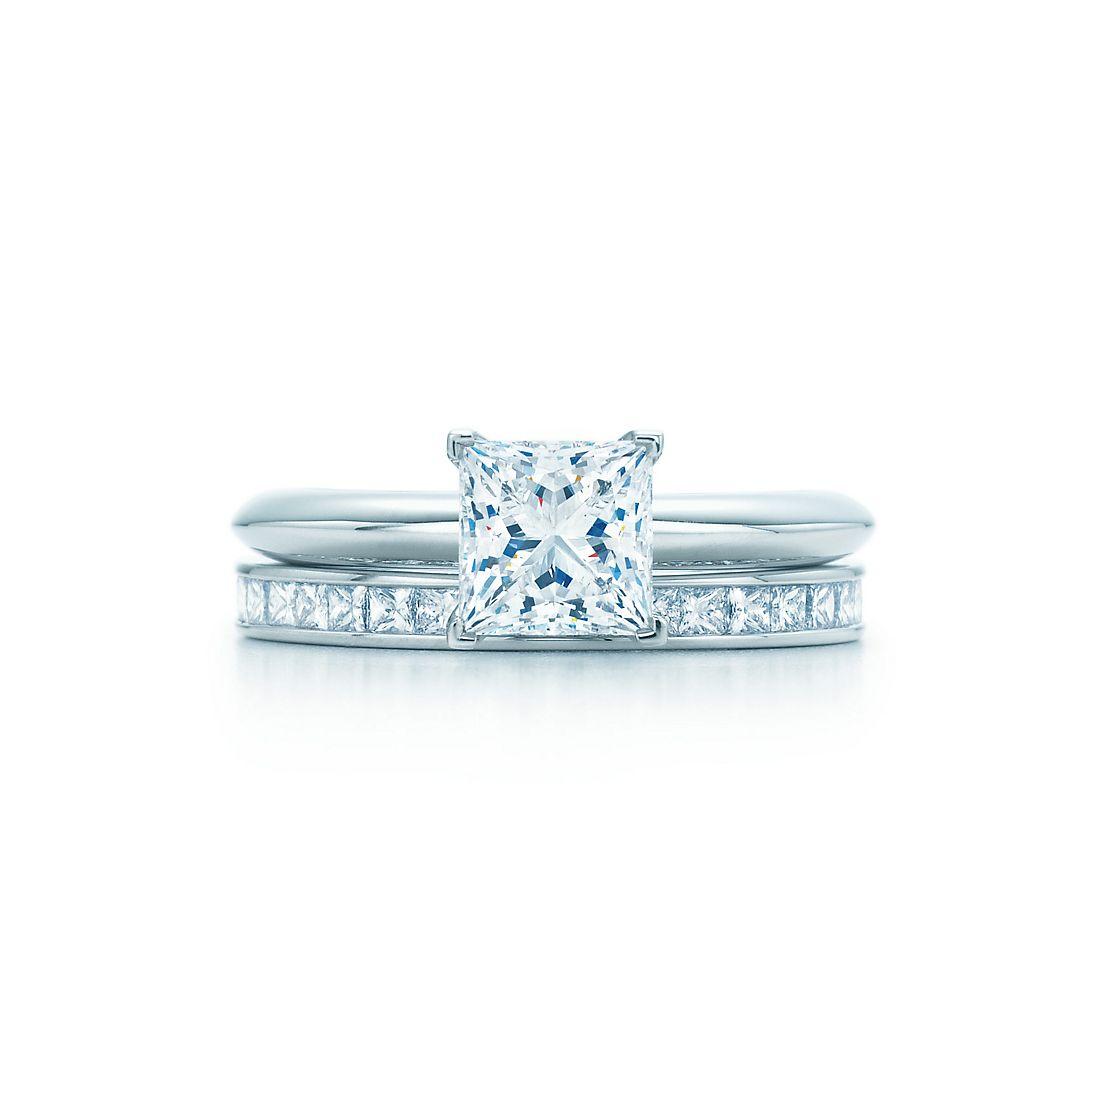 на фото  1,2 кар, второе кольцо — Кольцо с бриллиантами в огранке  «Принцесса» 9bfac8e23cf